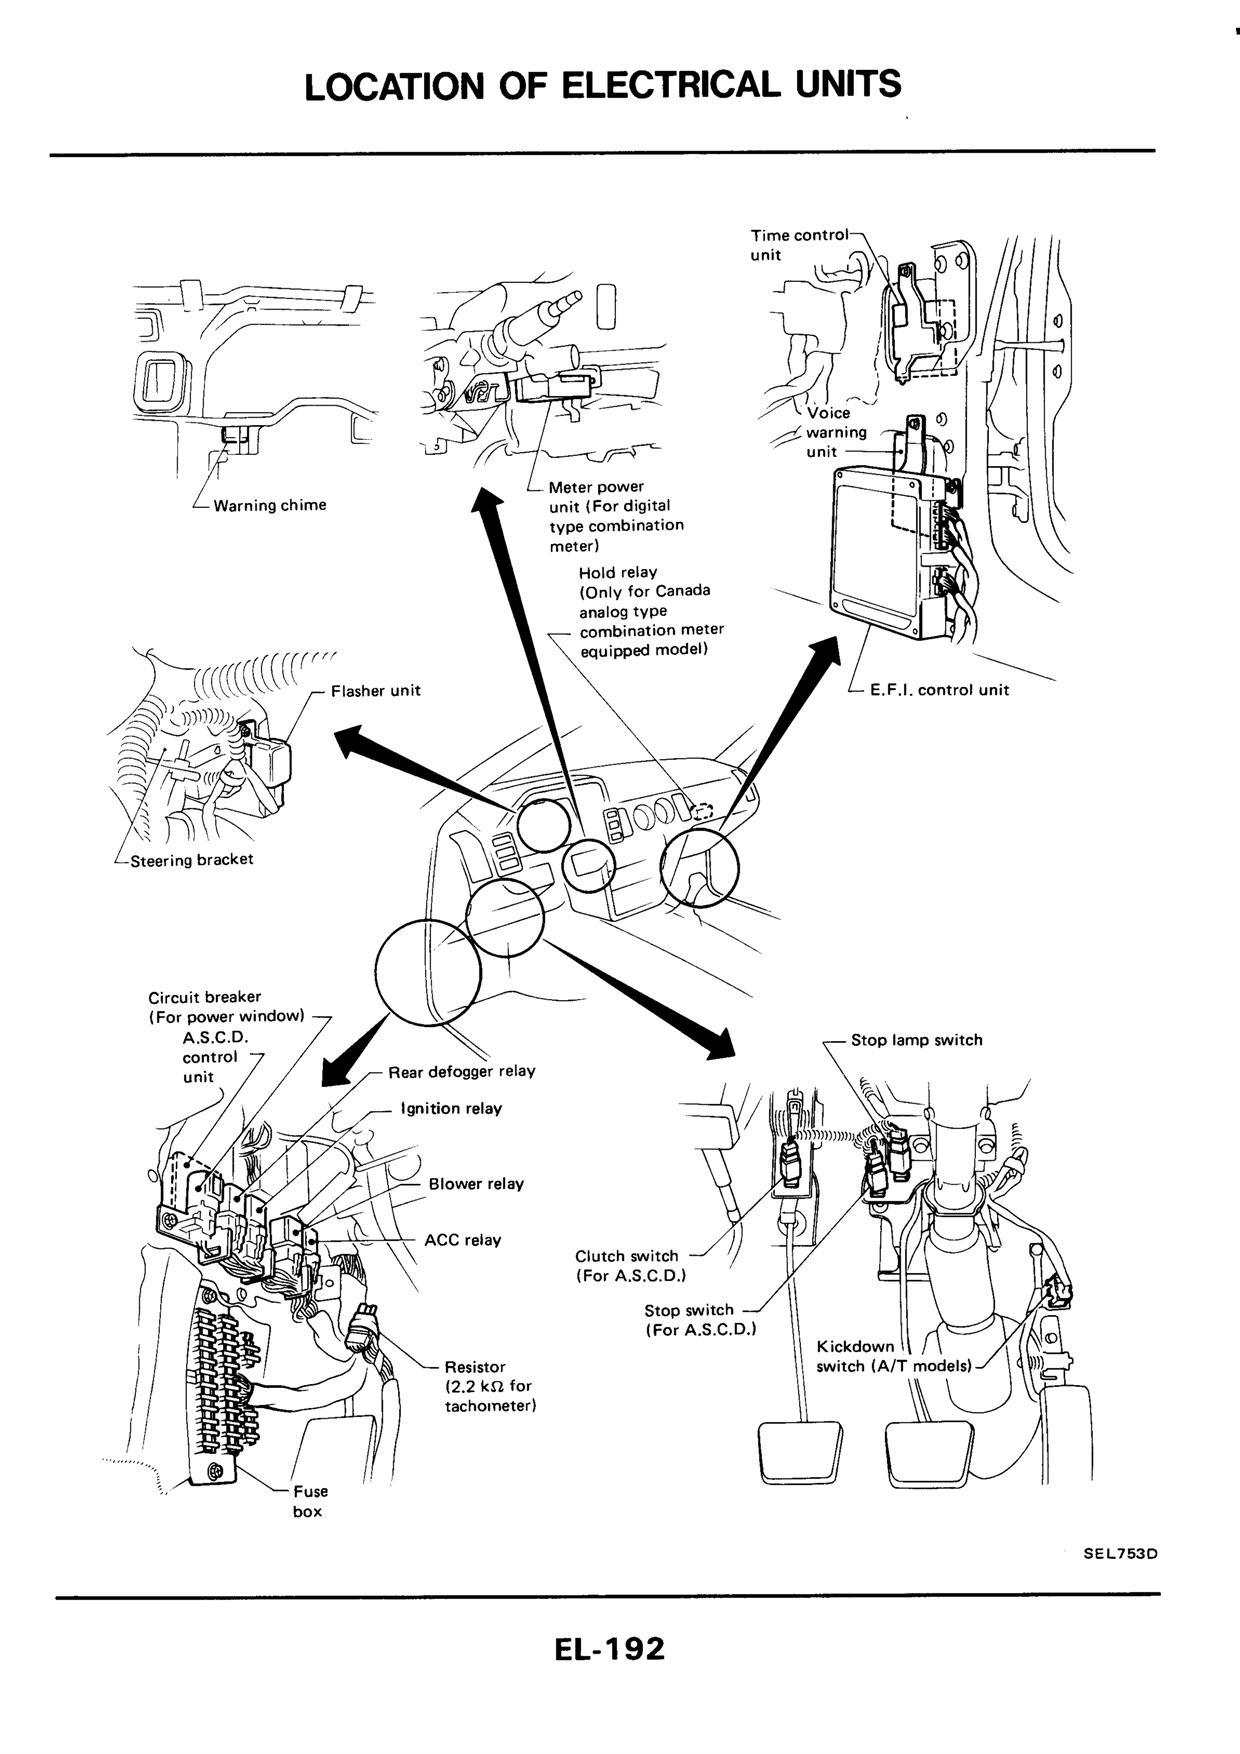 1989 300zx Engine Wiring Diagram 2006 F150 Fuse Panel Diagram Bullet Squier Ke2x Jeanjaures37 Fr